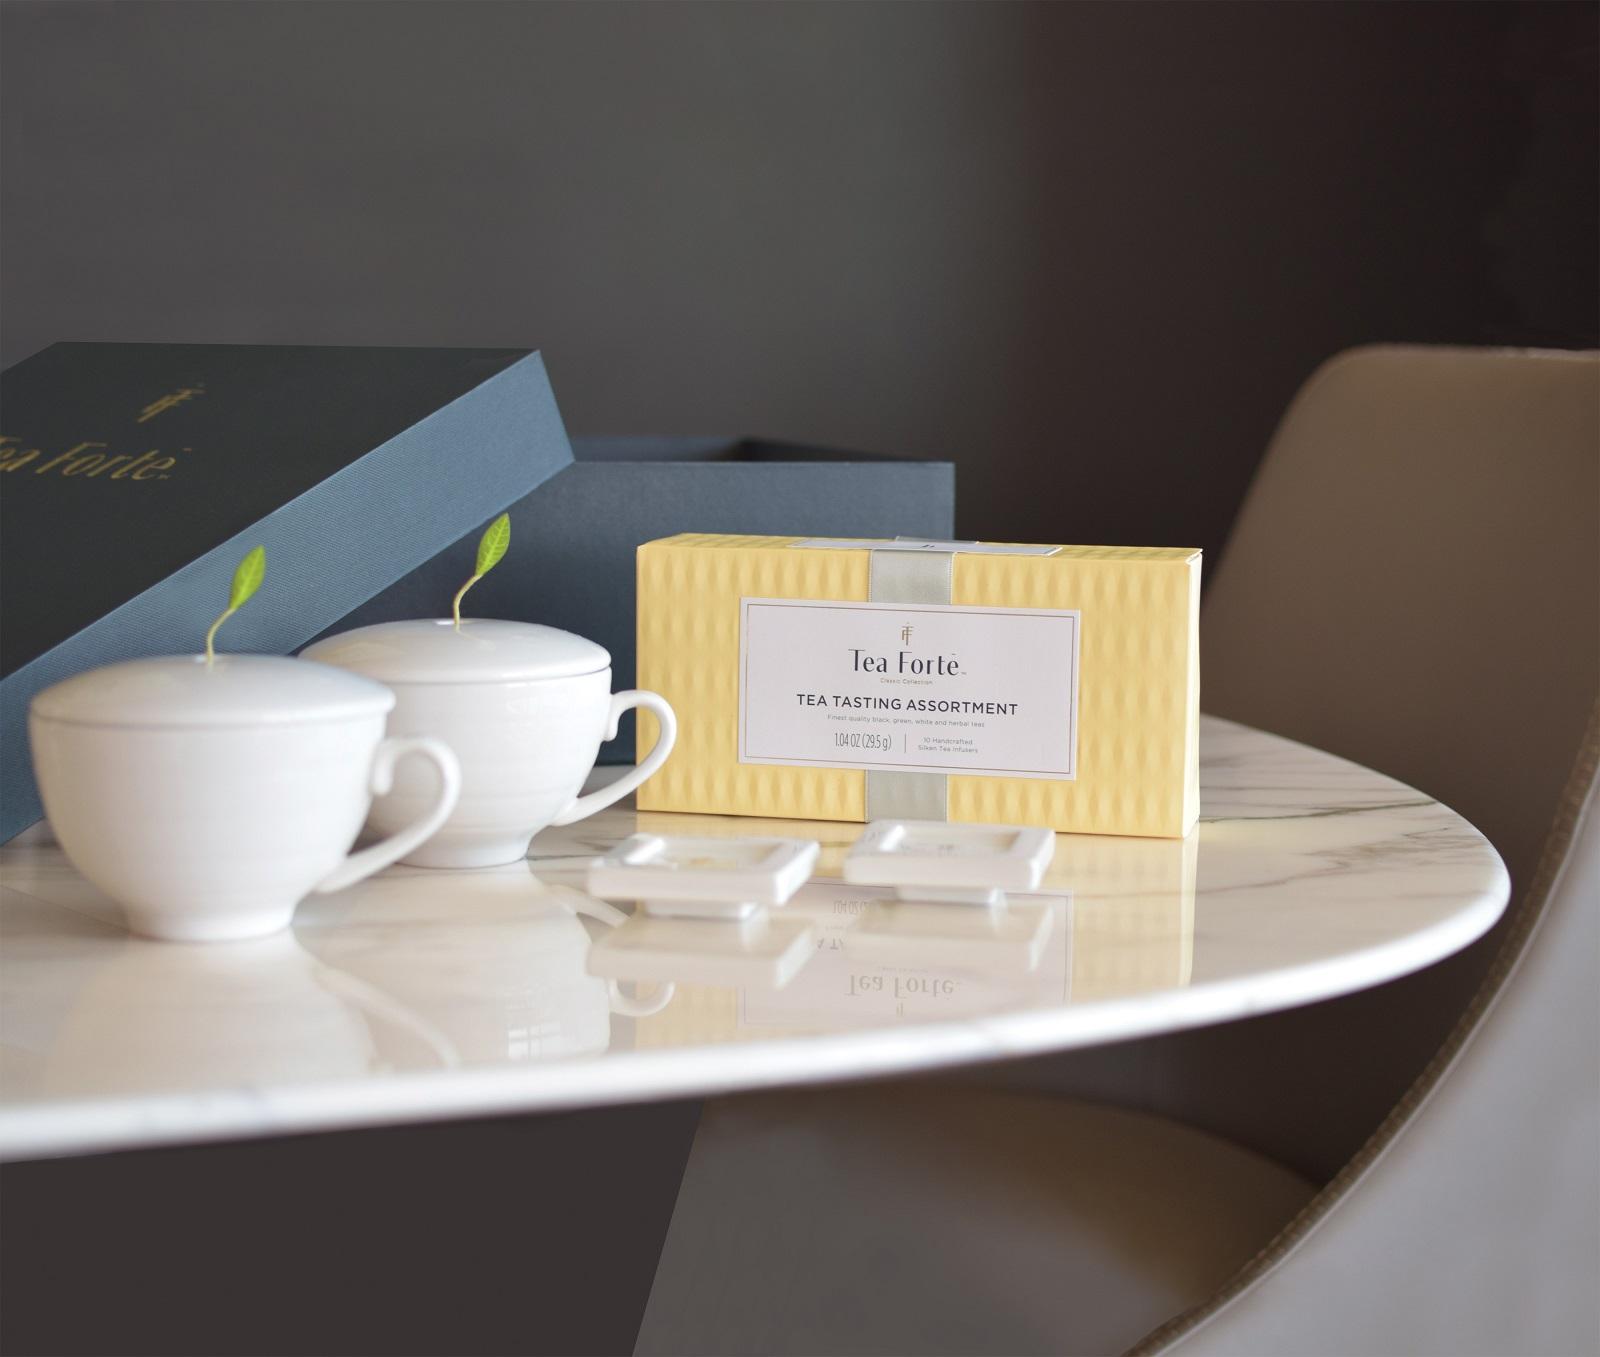 Tea Forte 雙人分享 茶品茶具禮盒 Tea Duet Gift Set